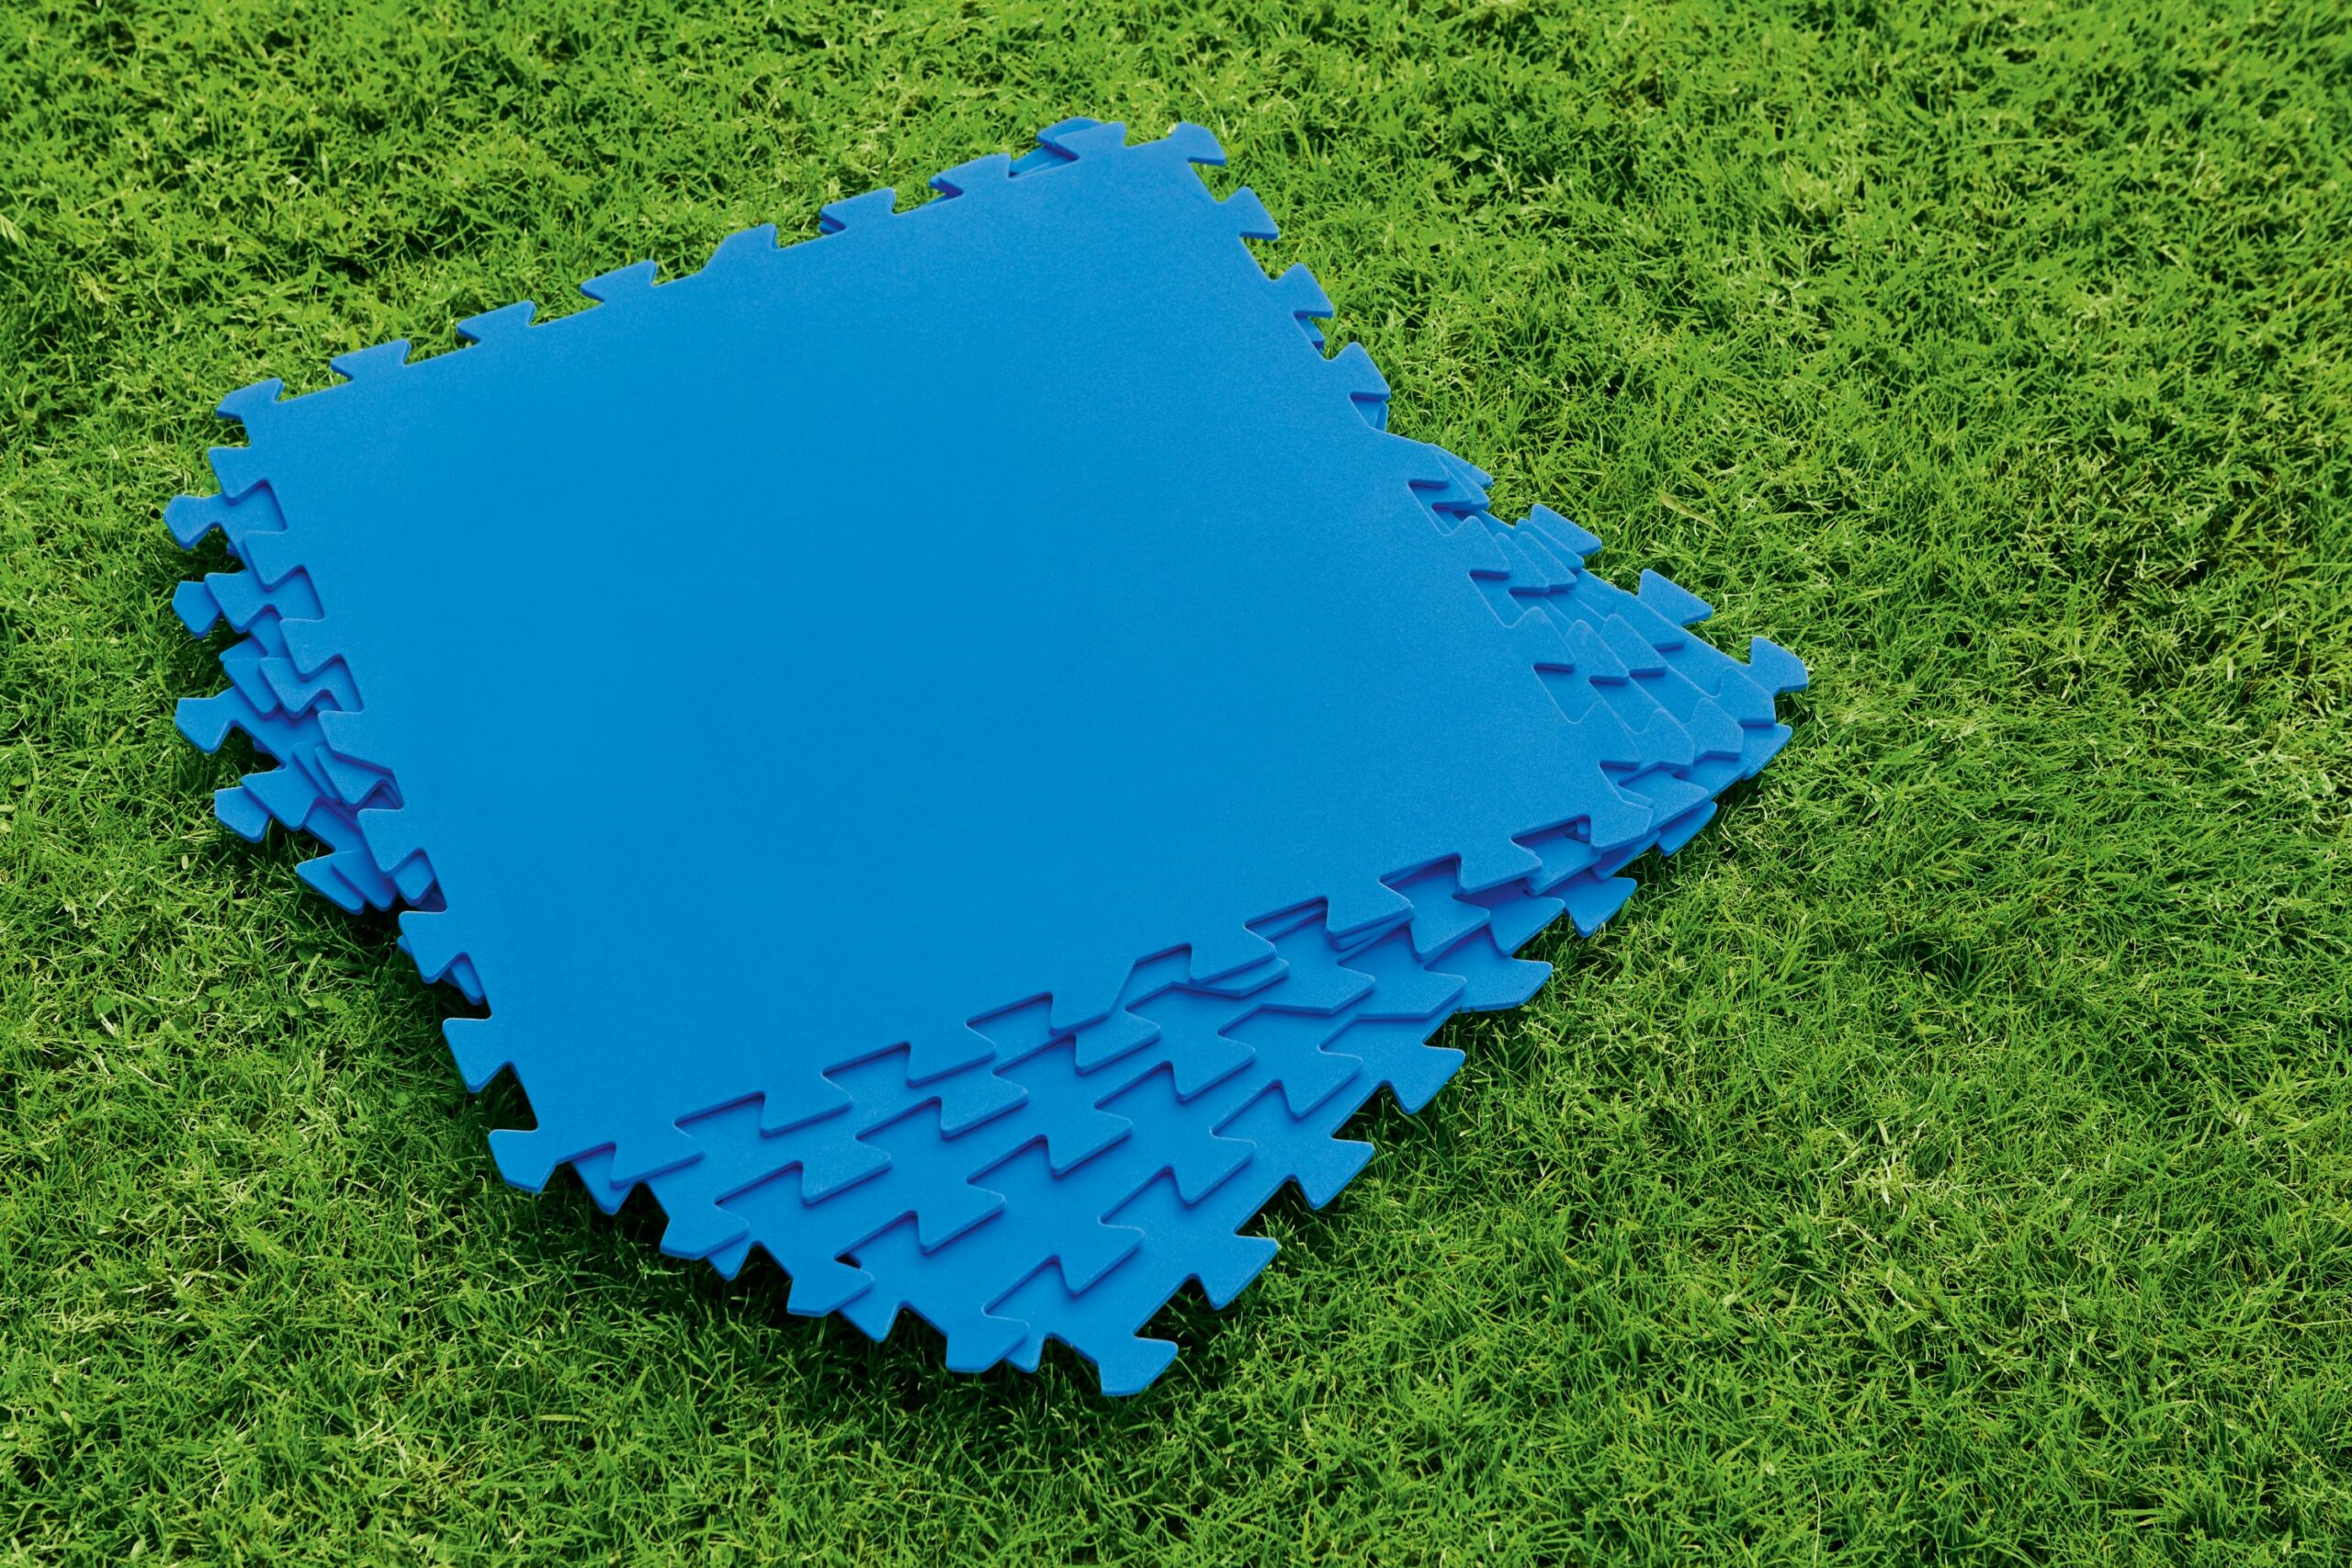 Bestway gulvbeskytter til hagebasseng (50cm x 50cm) frontbilde